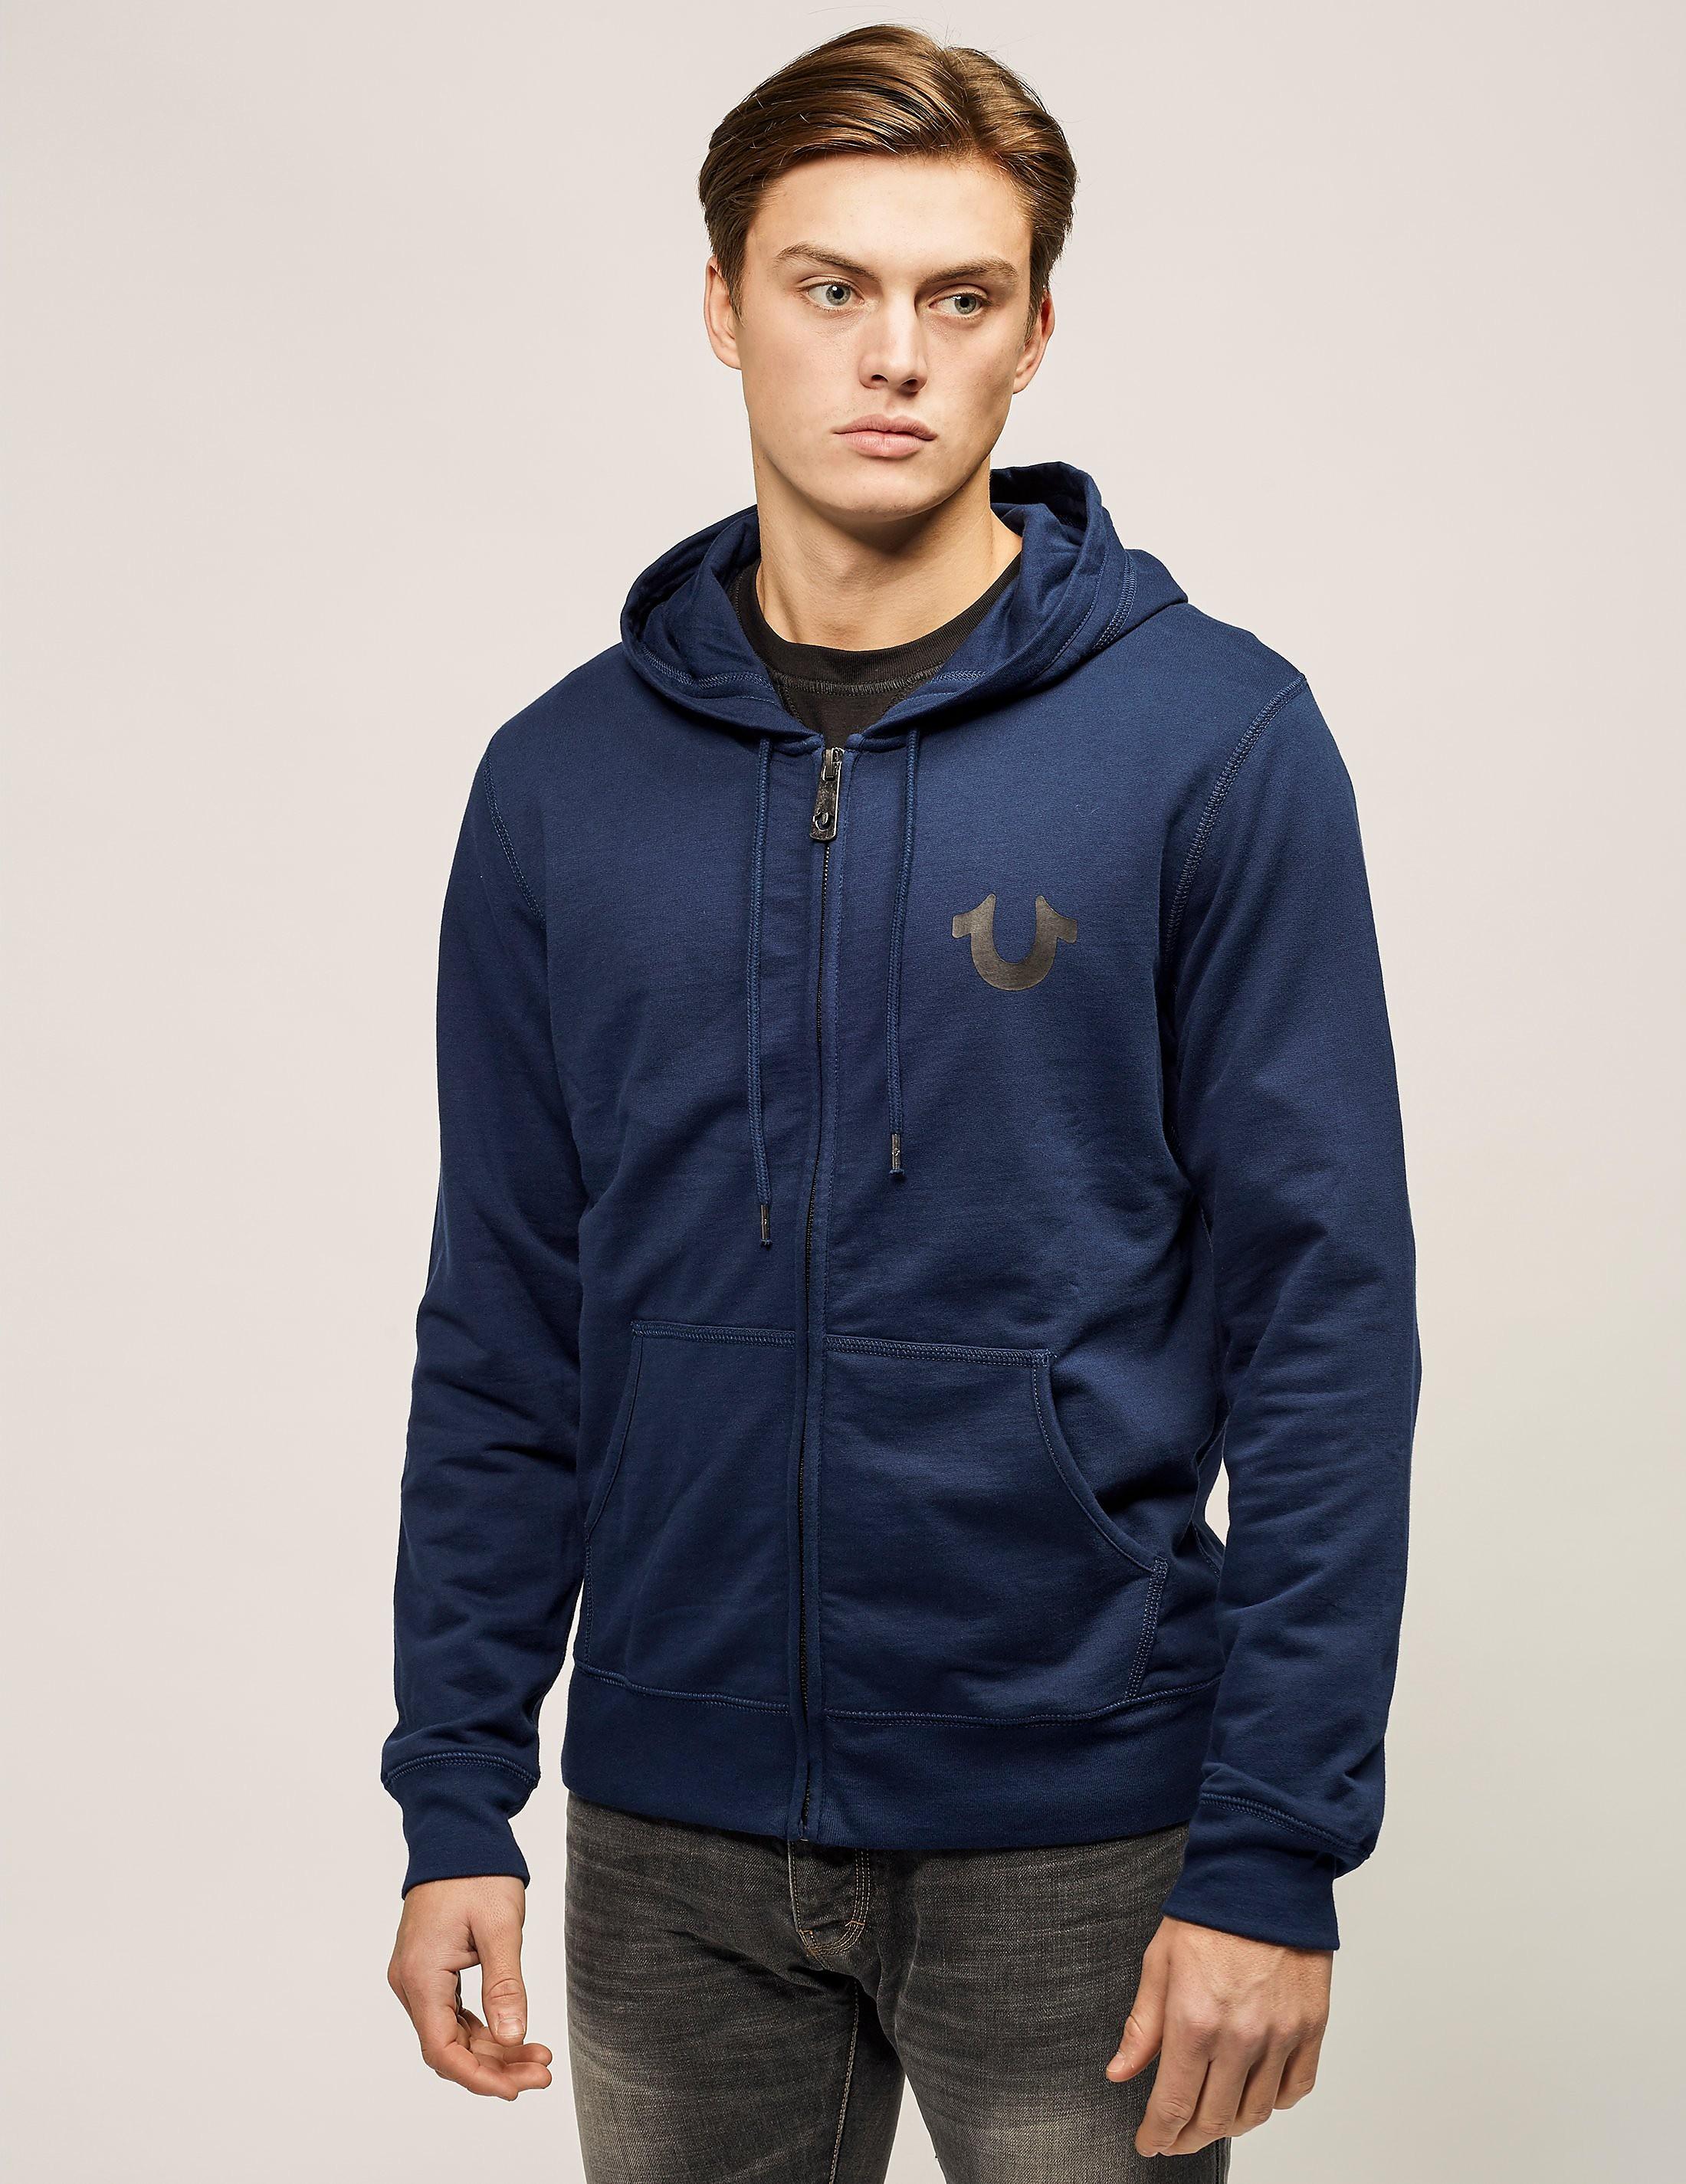 True Religion Crafted Zip Hooded Sweatshirt